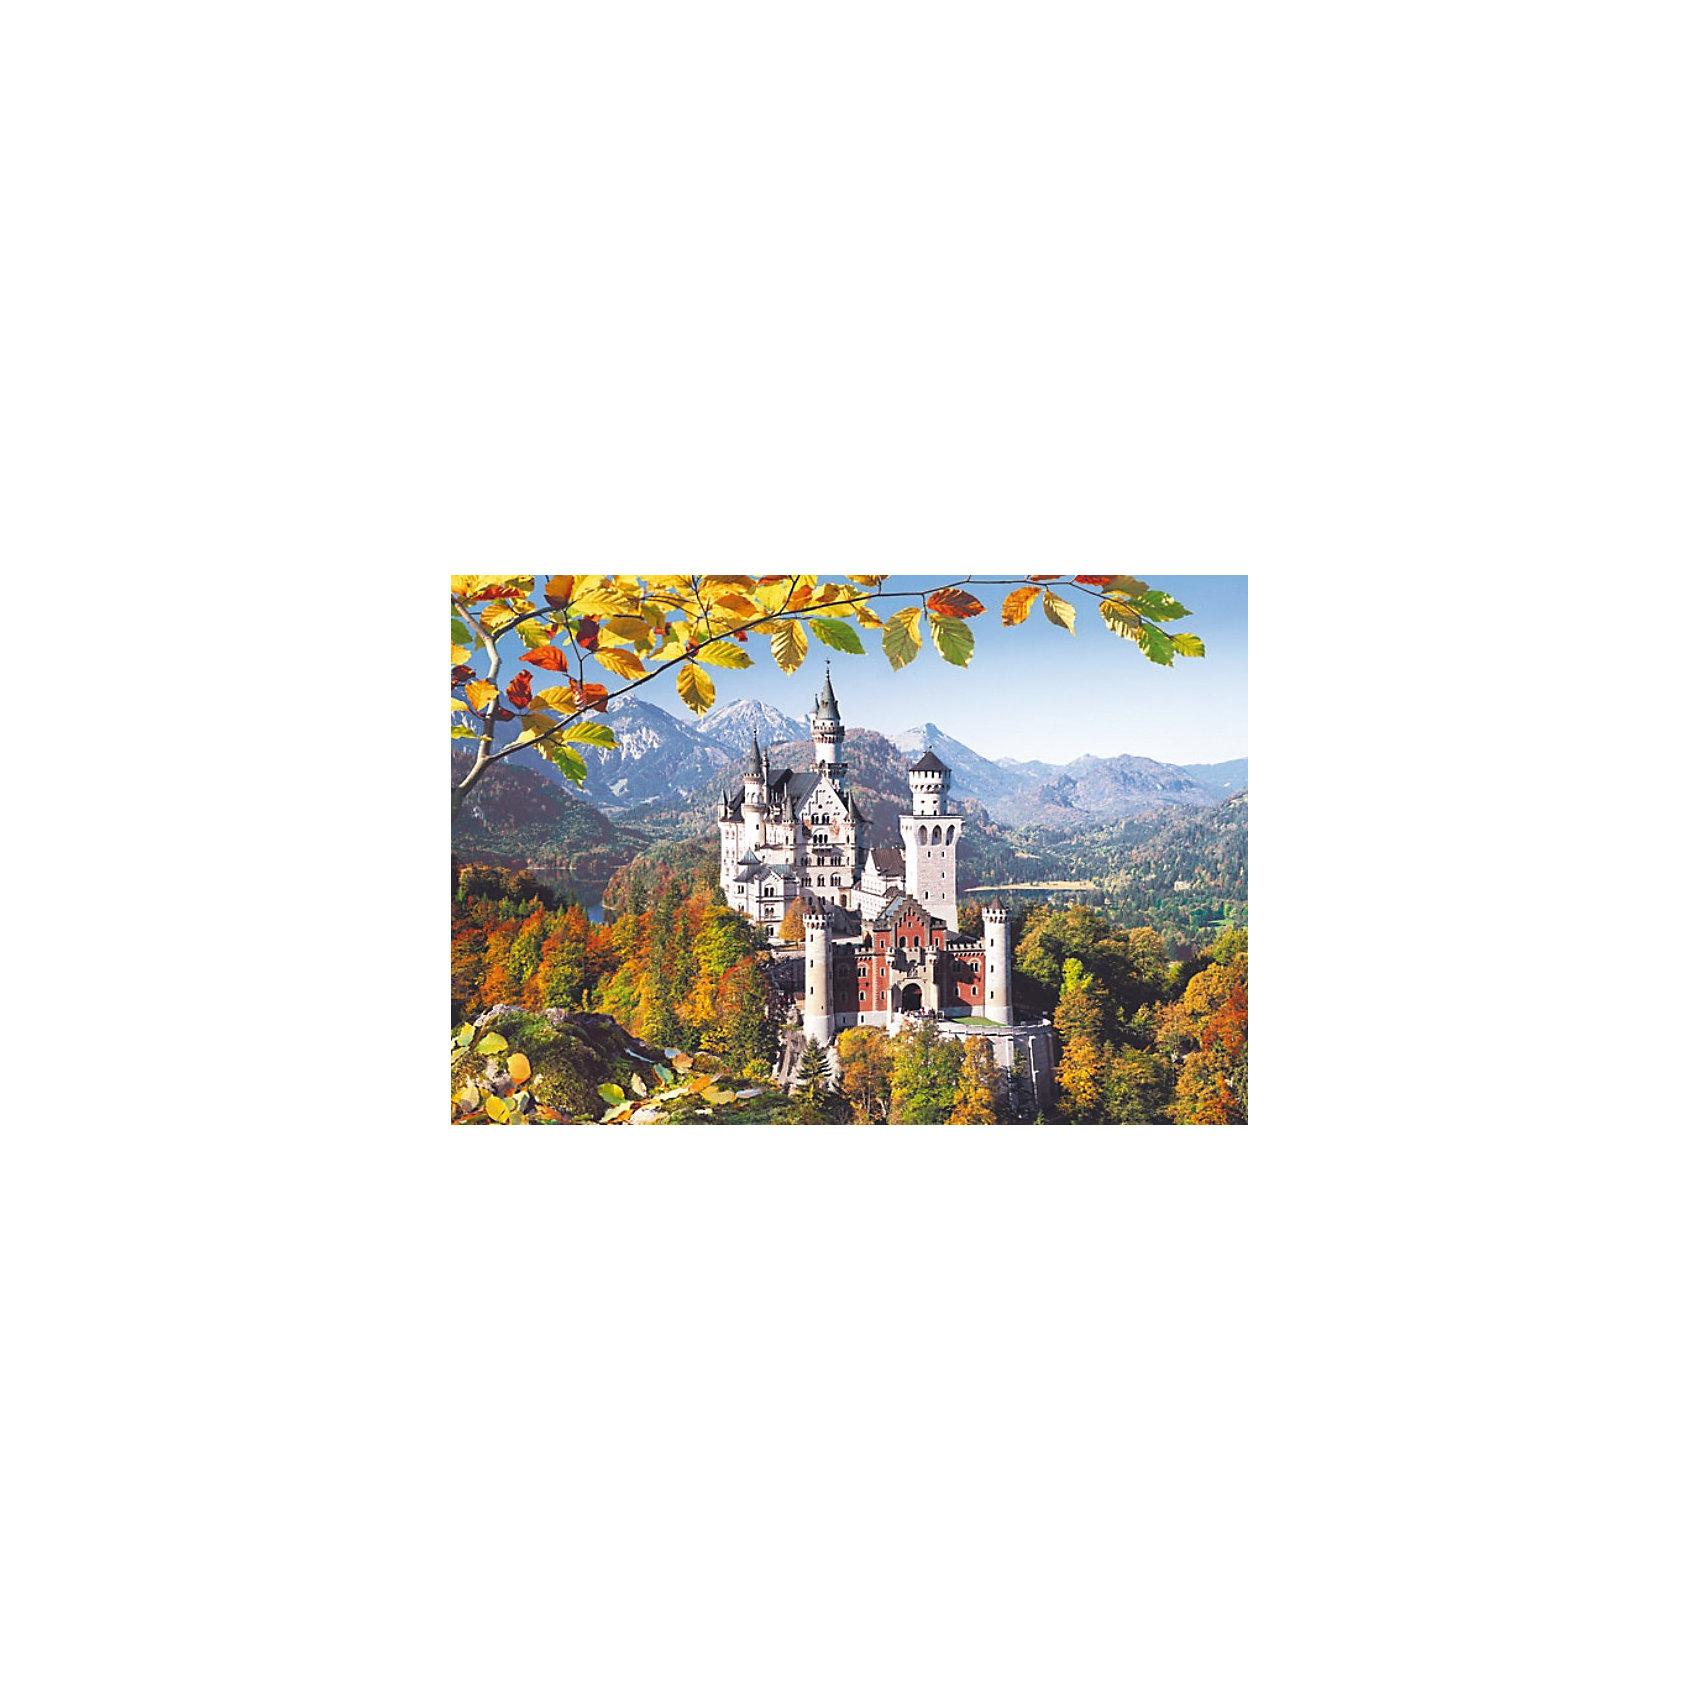 Пазл Бавария, 3000 деталей, CastorlandИзображение: Замок на побережье. Кол-во деталей 3000<br><br>Размер изображения: 92*68 см.<br><br>Ширина мм: 385<br>Глубина мм: 275<br>Высота мм: 50<br>Вес г: 950<br>Возраст от месяцев: 192<br>Возраст до месяцев: 1188<br>Пол: Унисекс<br>Возраст: Детский<br>Количество деталей: 3000<br>SKU: 2328208